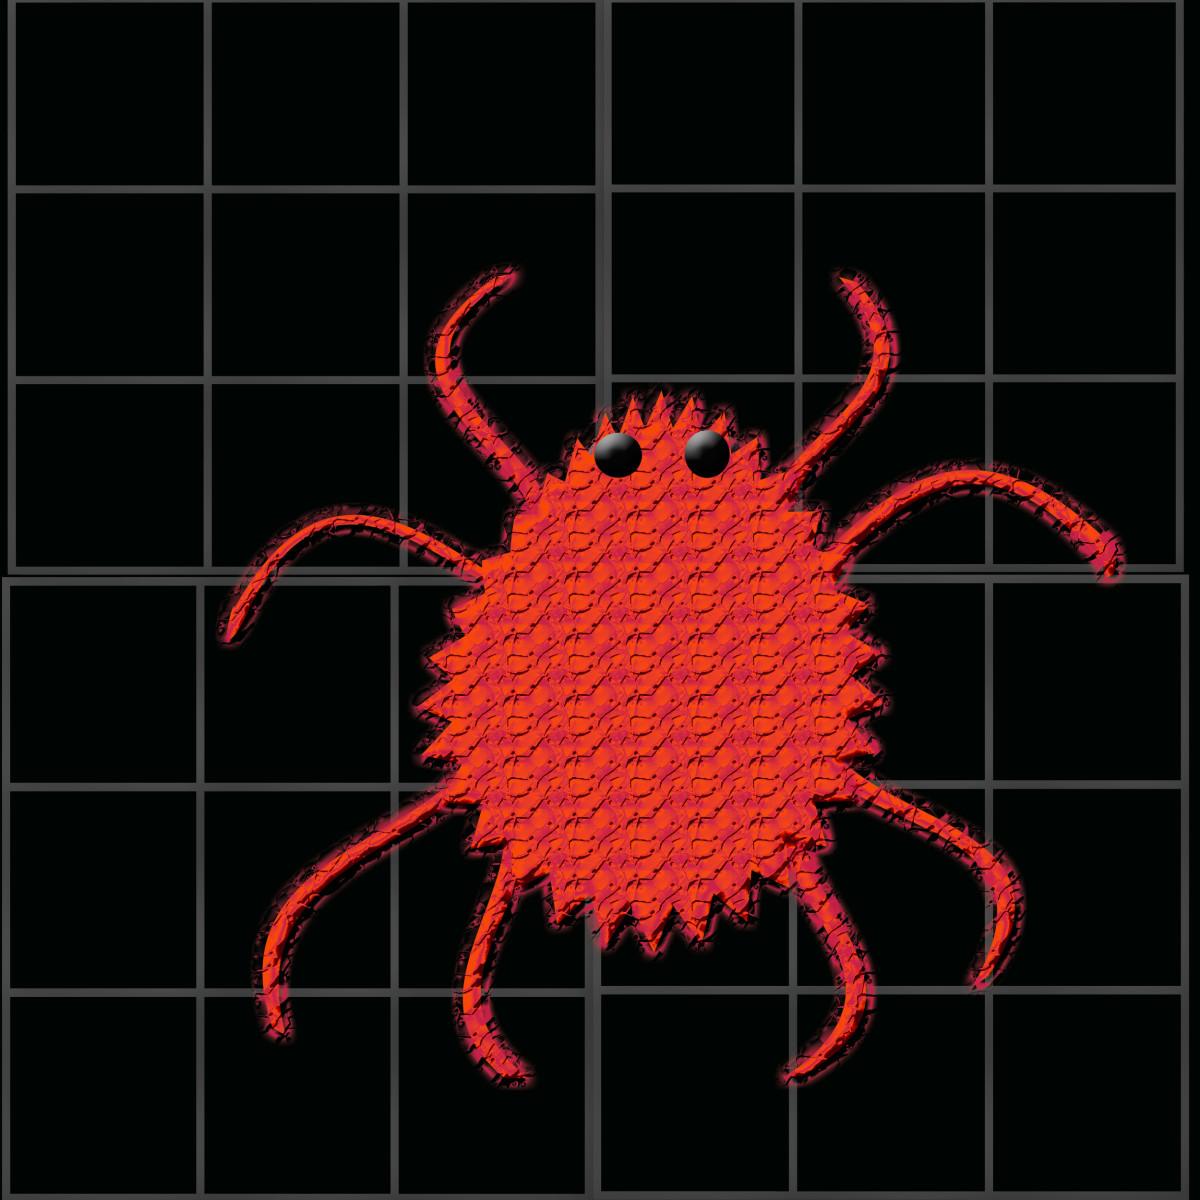 Tick-borne virus is one of the causes of meningoencephalitis.